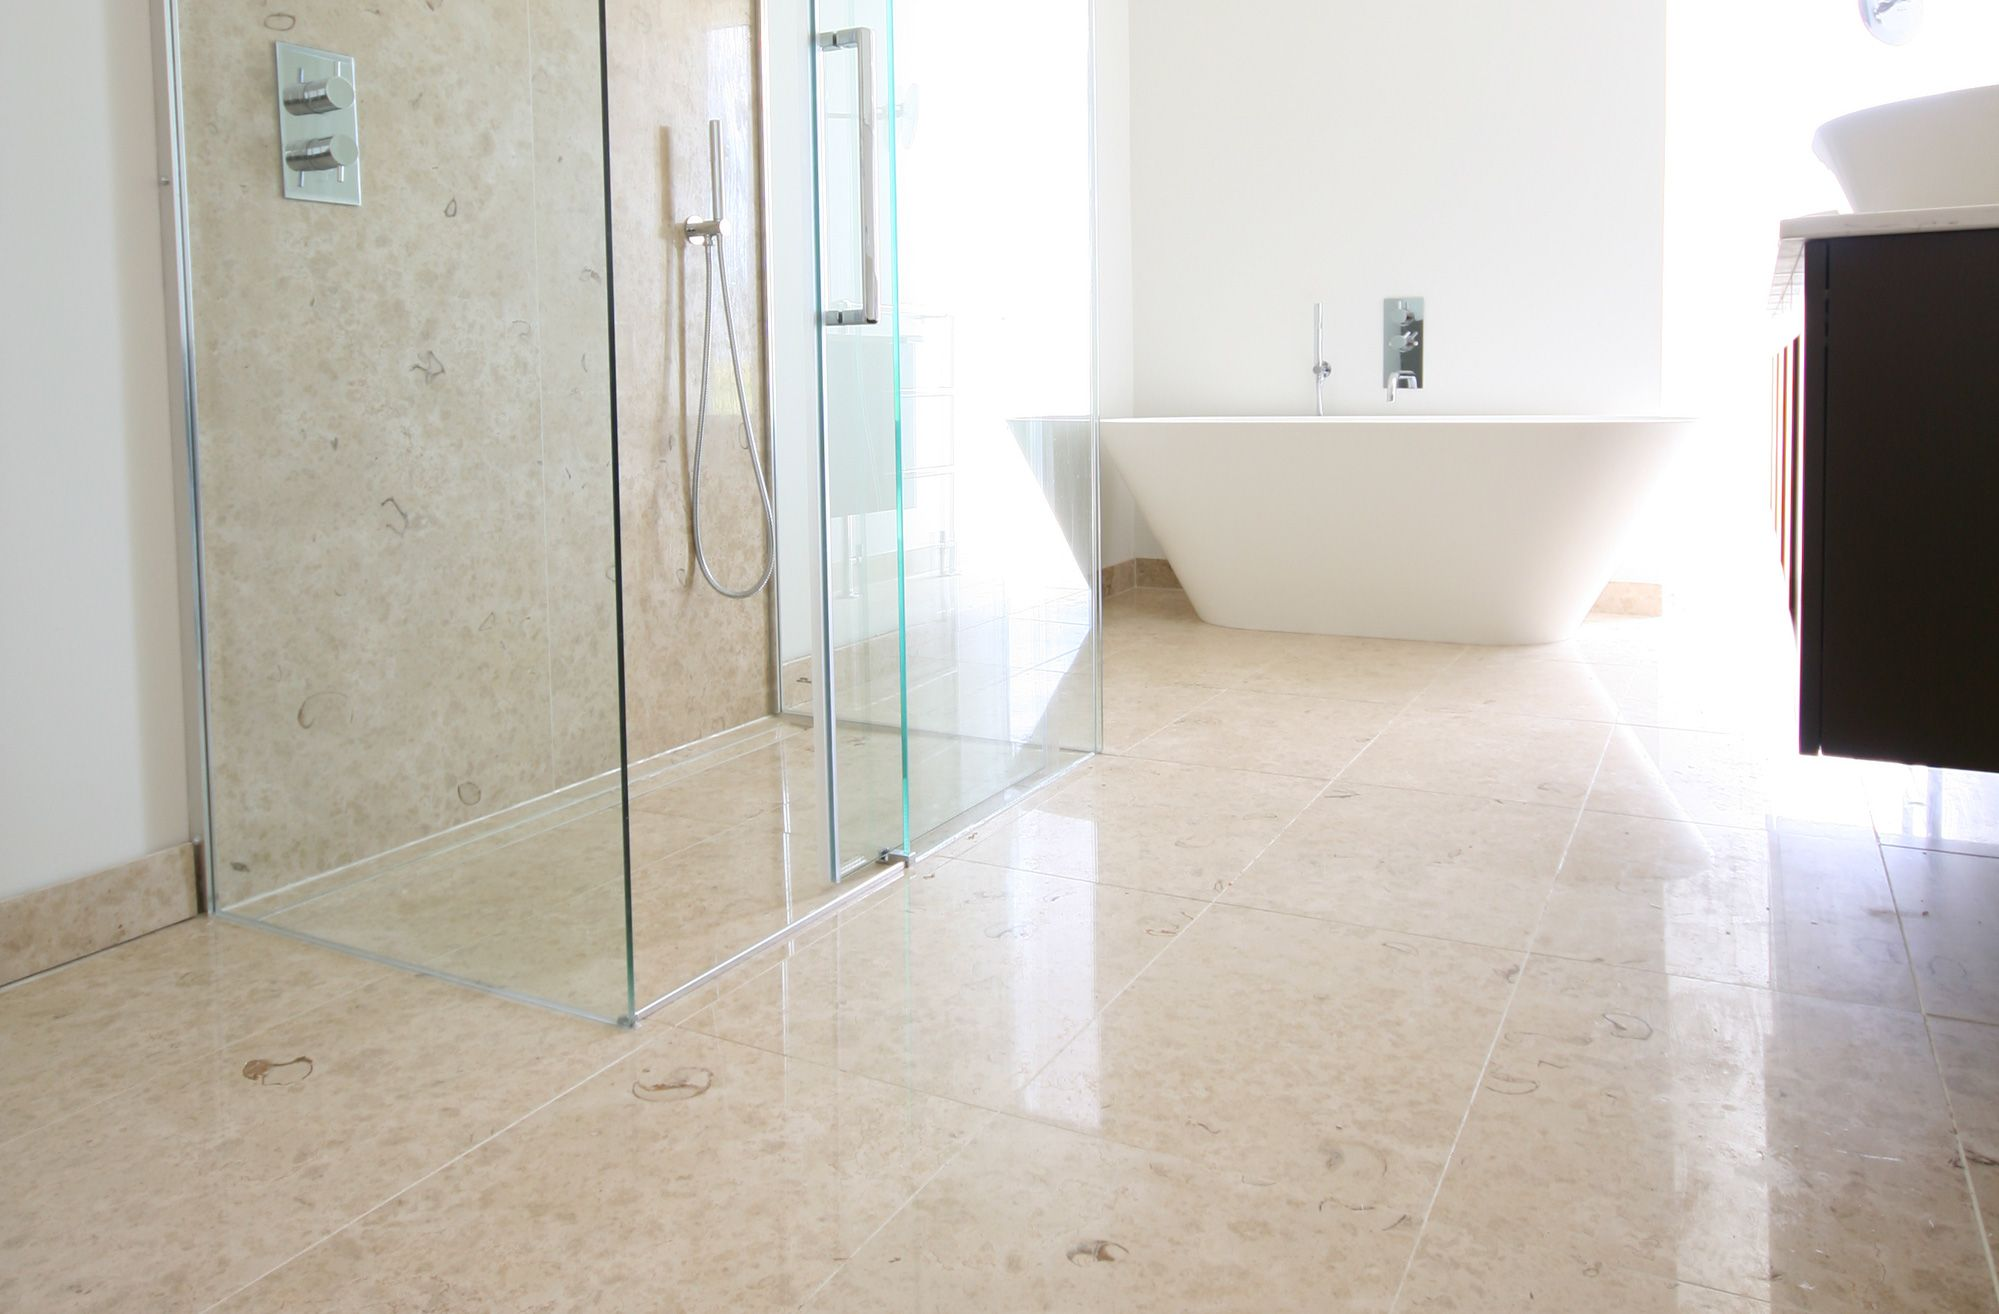 Best polished limestone floor tiles photos flooring area rugs best polished limestone floor tiles photos flooring area rugs doublecrazyfo Gallery